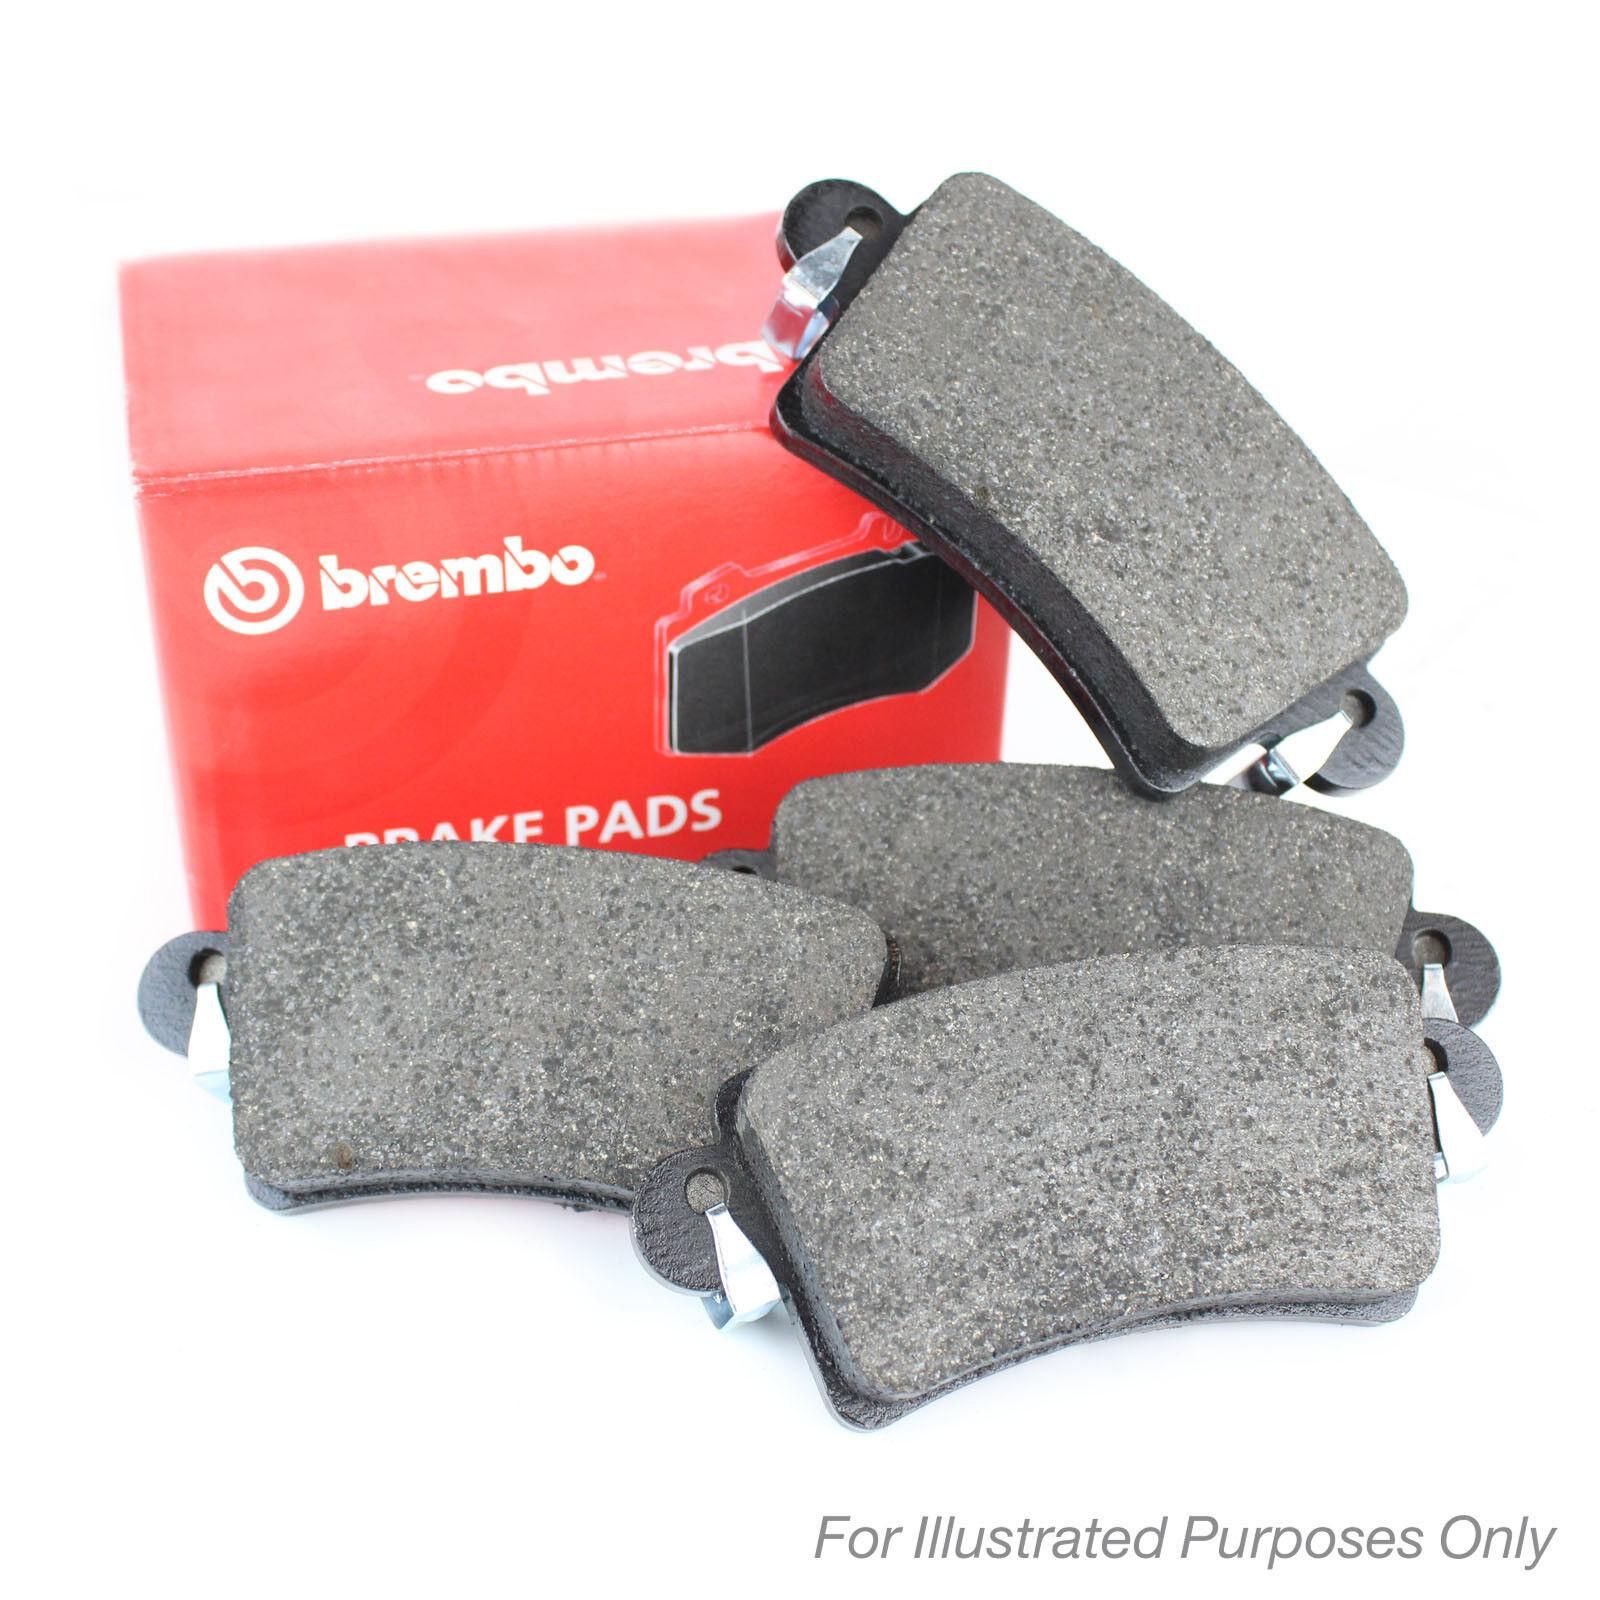 BREMBO GENUINE ORIGINAL BRAKE PADS FRONT AXLE P56025